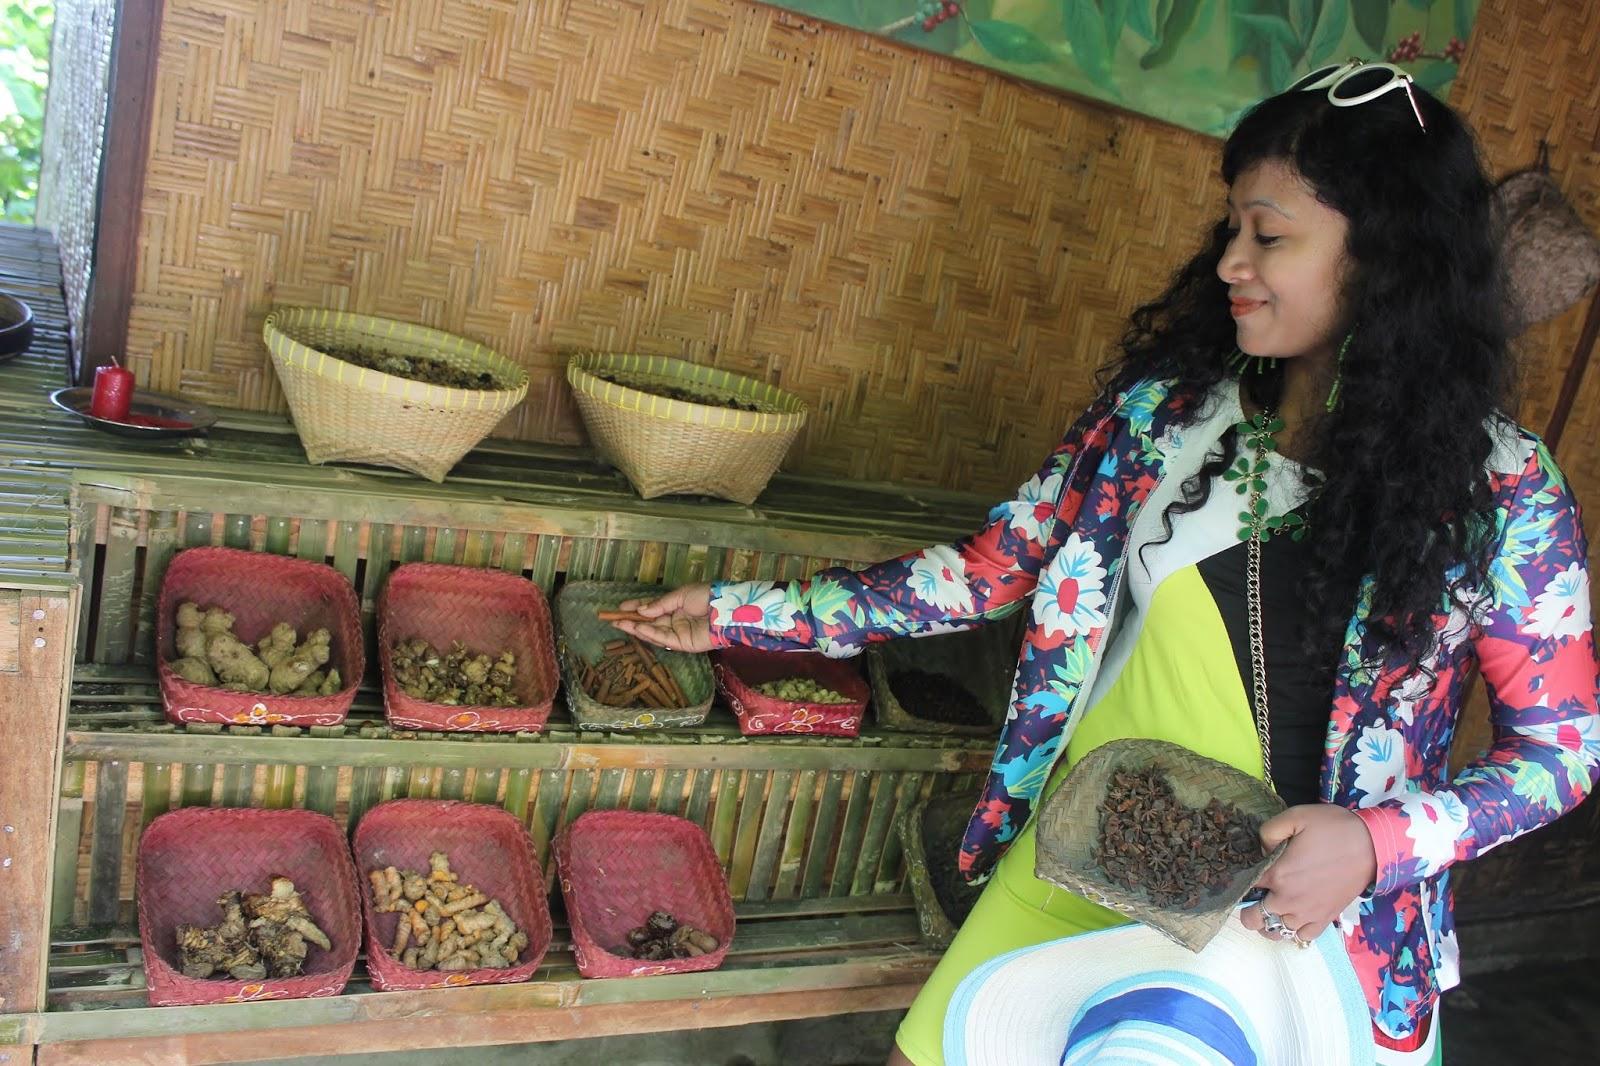 luwak coffee price  kopi ,luwak coffee amazon , luwak coffee bali  kopi, luwak coffee for sale,  luwak coffee process,  luwak coffee benefits,  kopi luwak coffee beans,  best luwak coffee brand